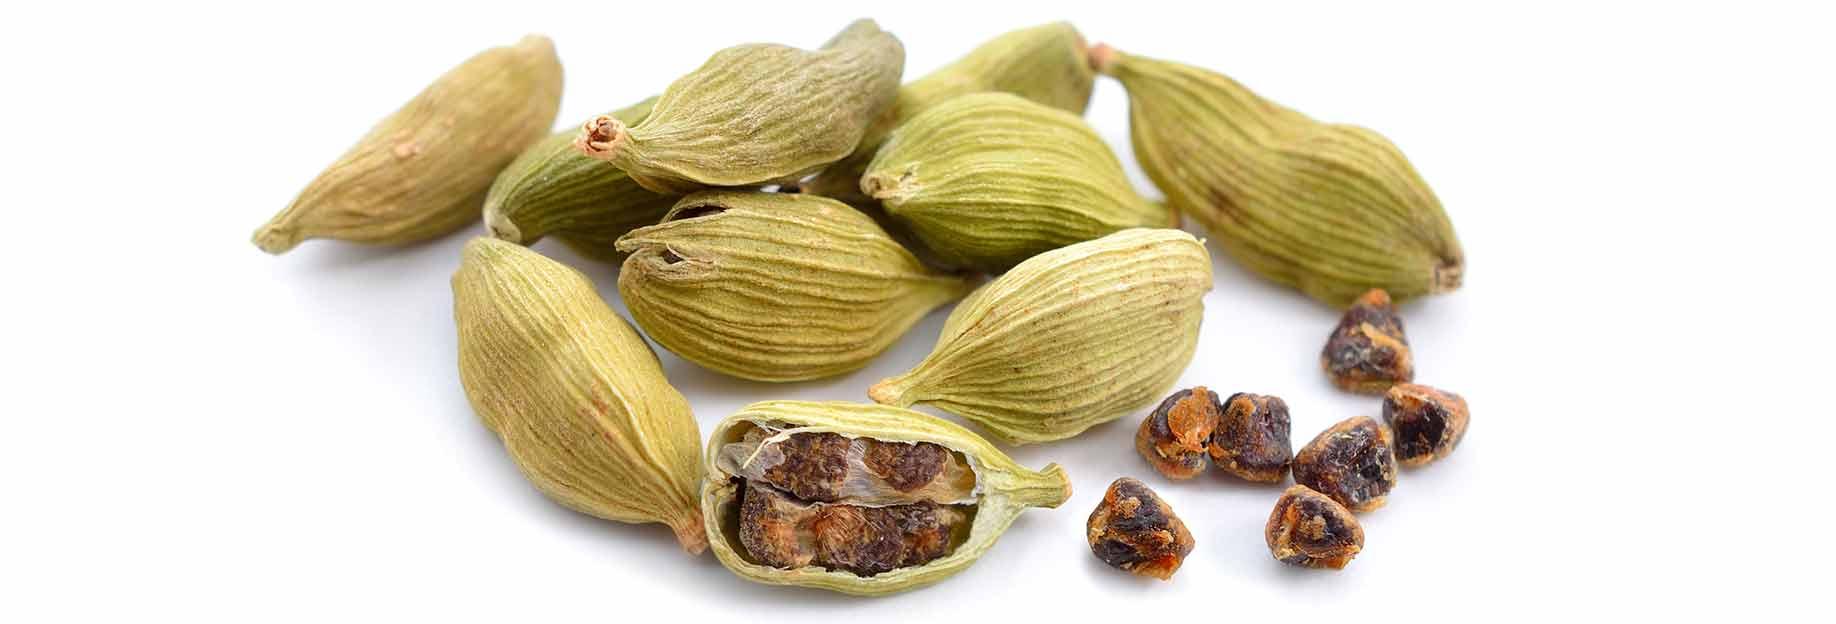 cardamom seeds for high blood pressure hypertension natural remedies herb